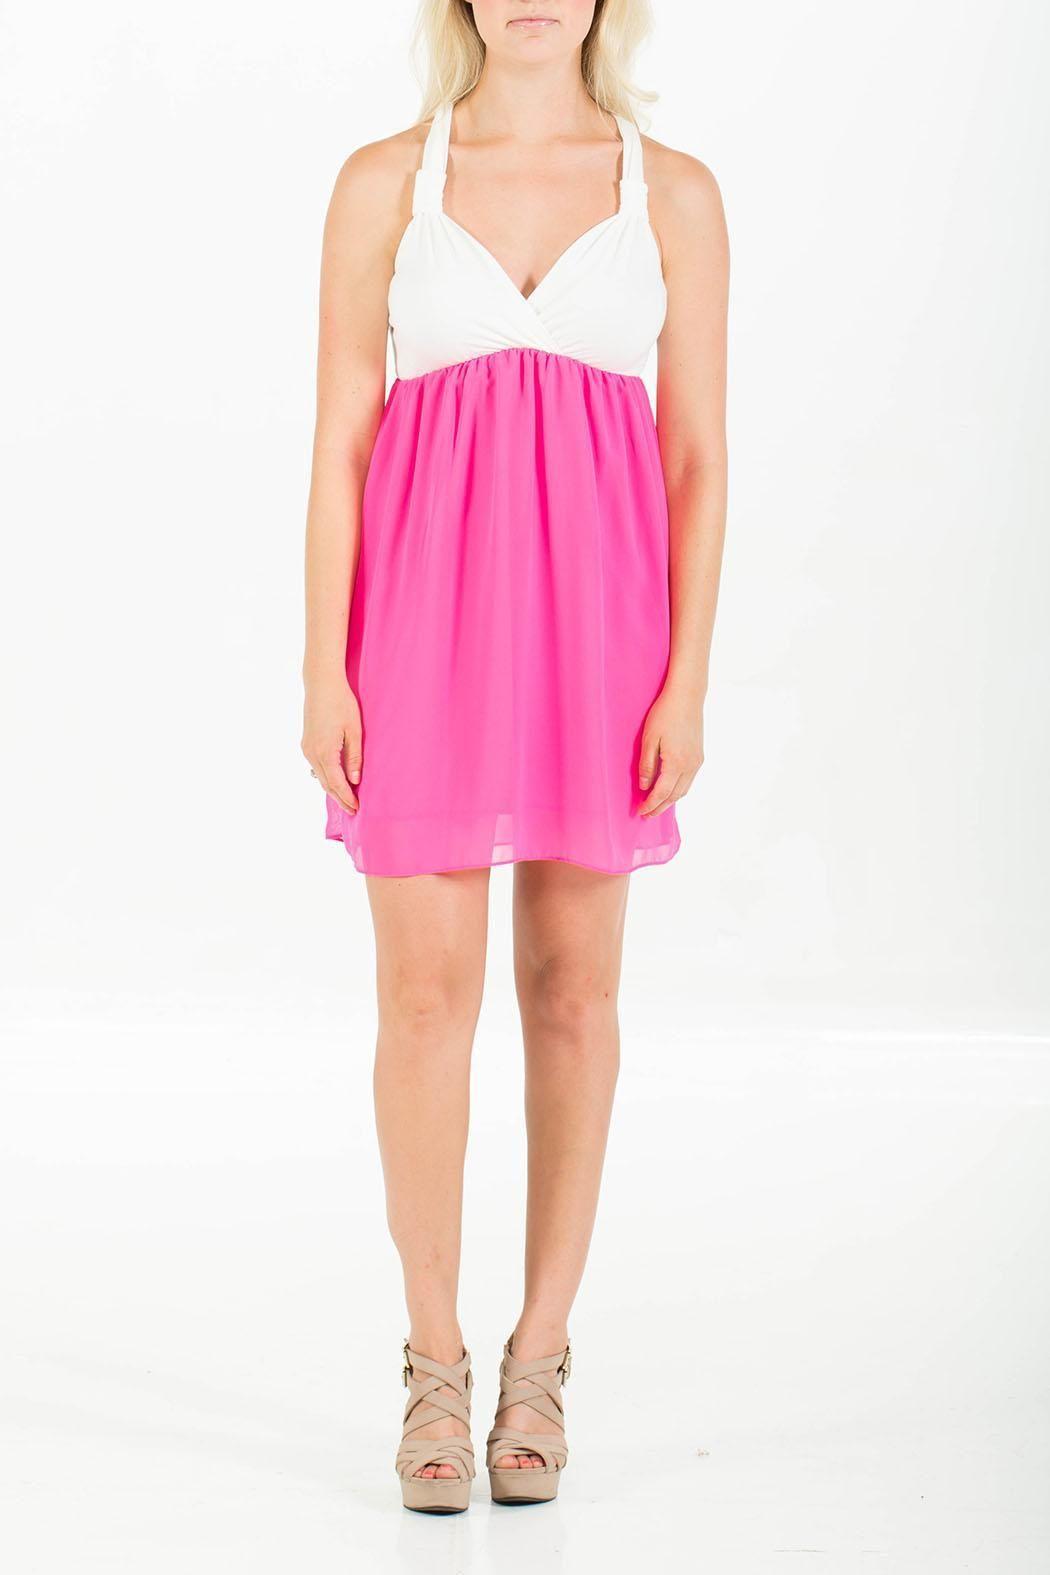 Nymphe Pink Sweetheart Dress